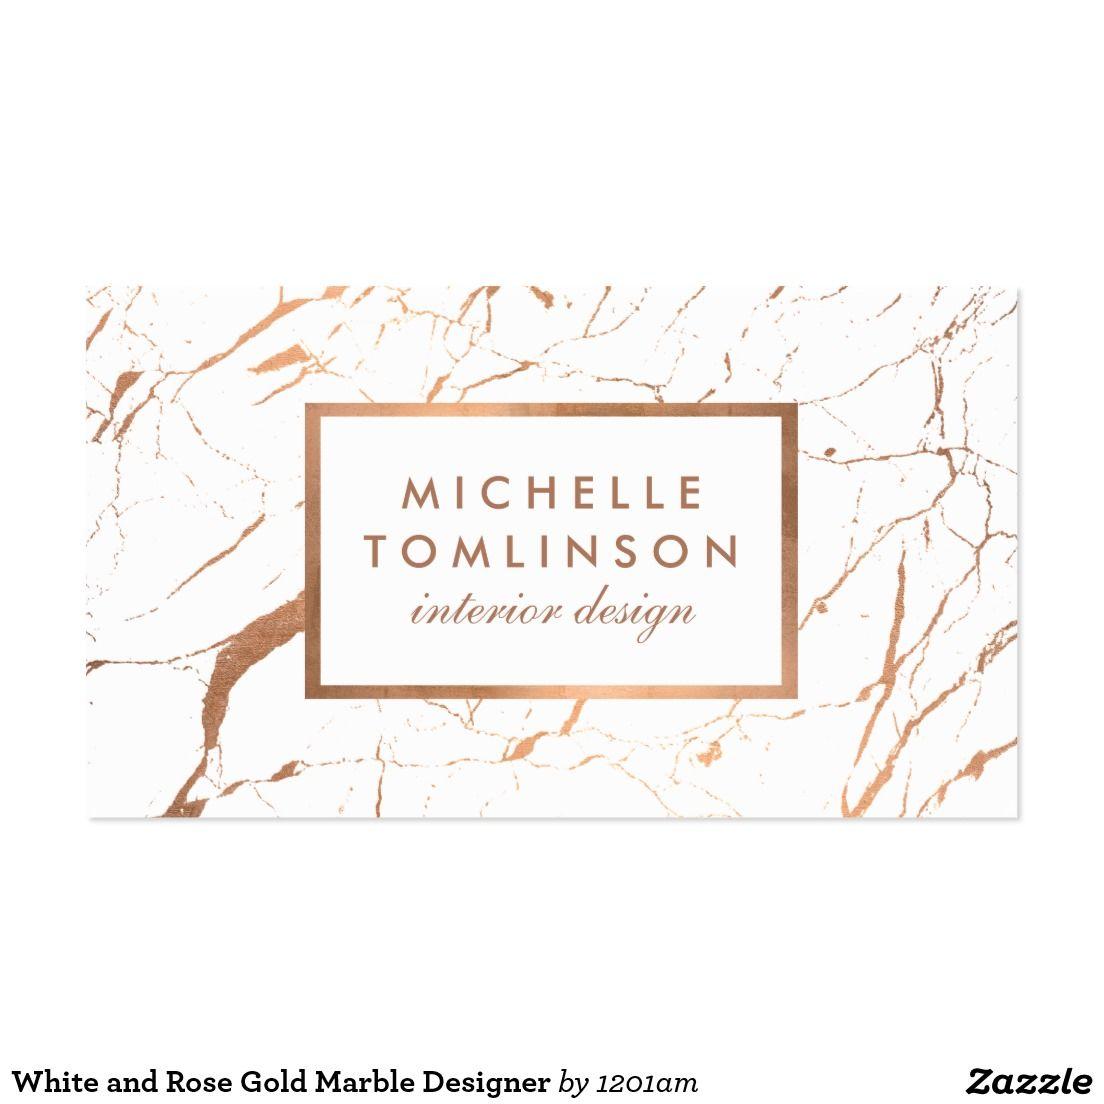 Profile card branding business card design gold - Creative names for interior design business ...